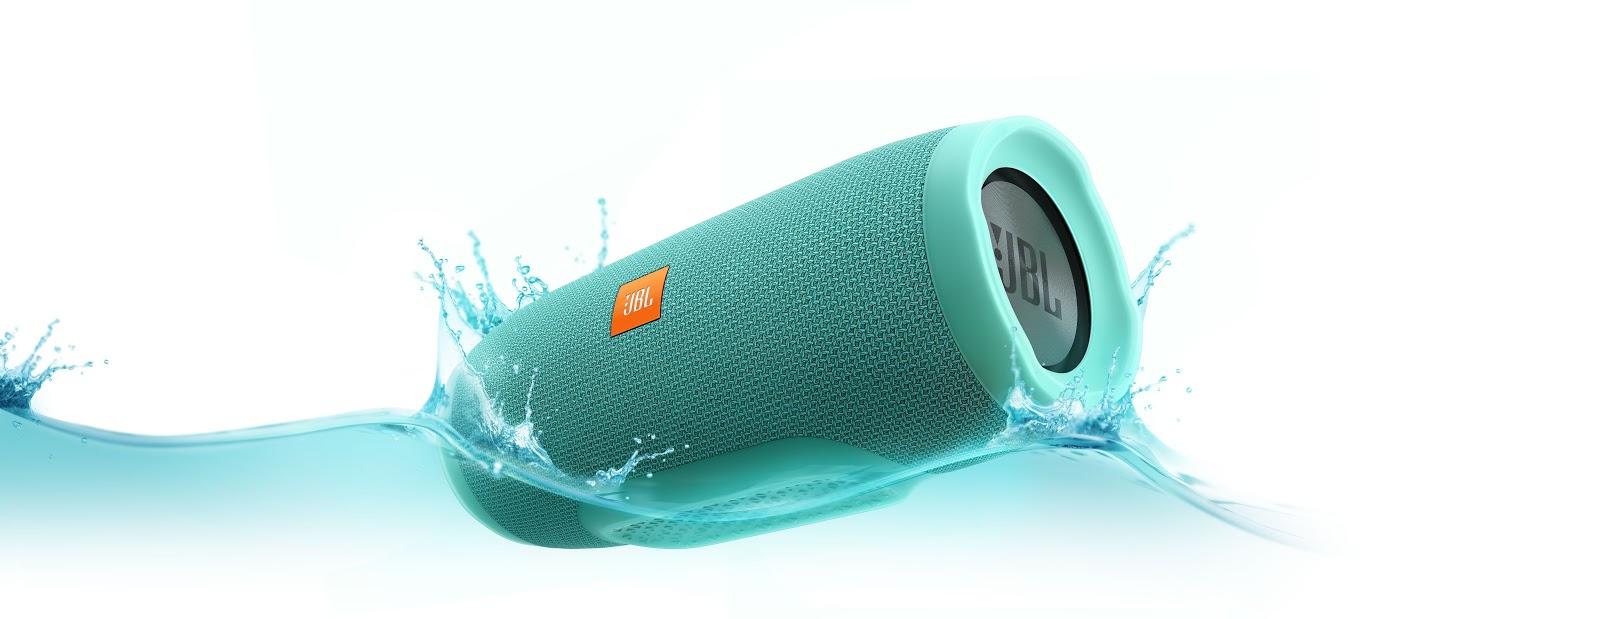 JBL Charge 3 Full-Featured Waterproof Portable Speaker